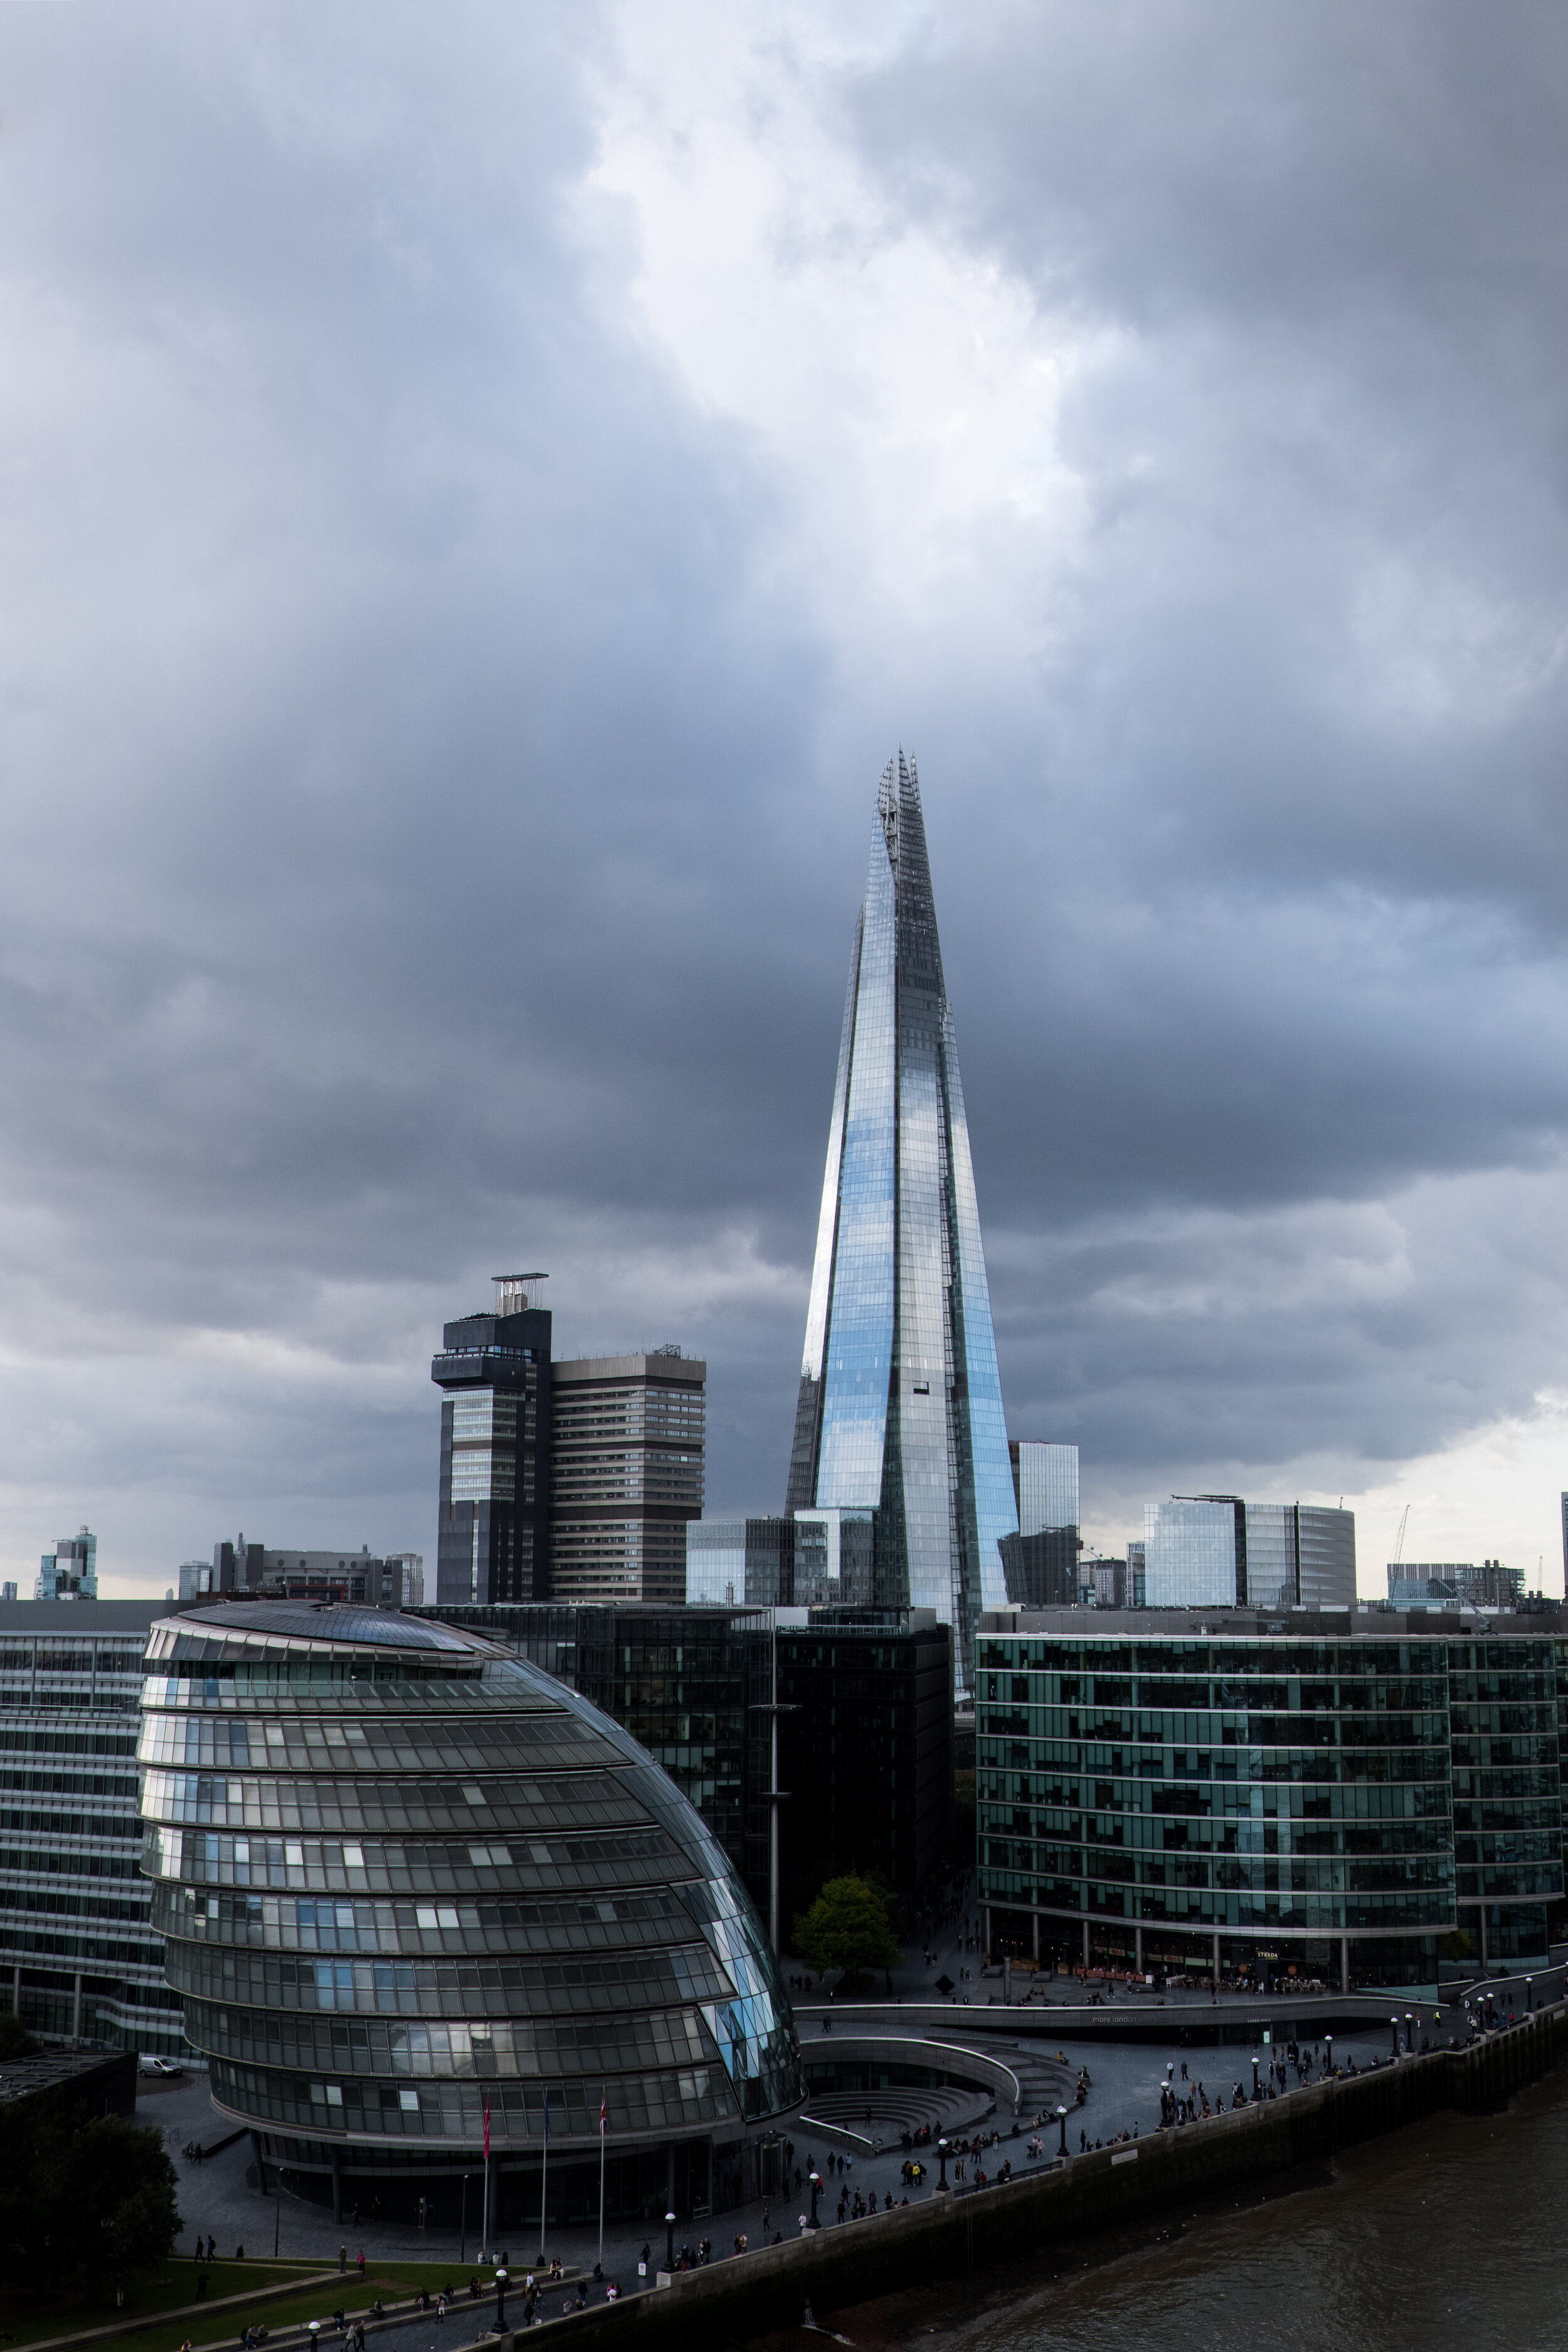 Dramatic skies - London 2019